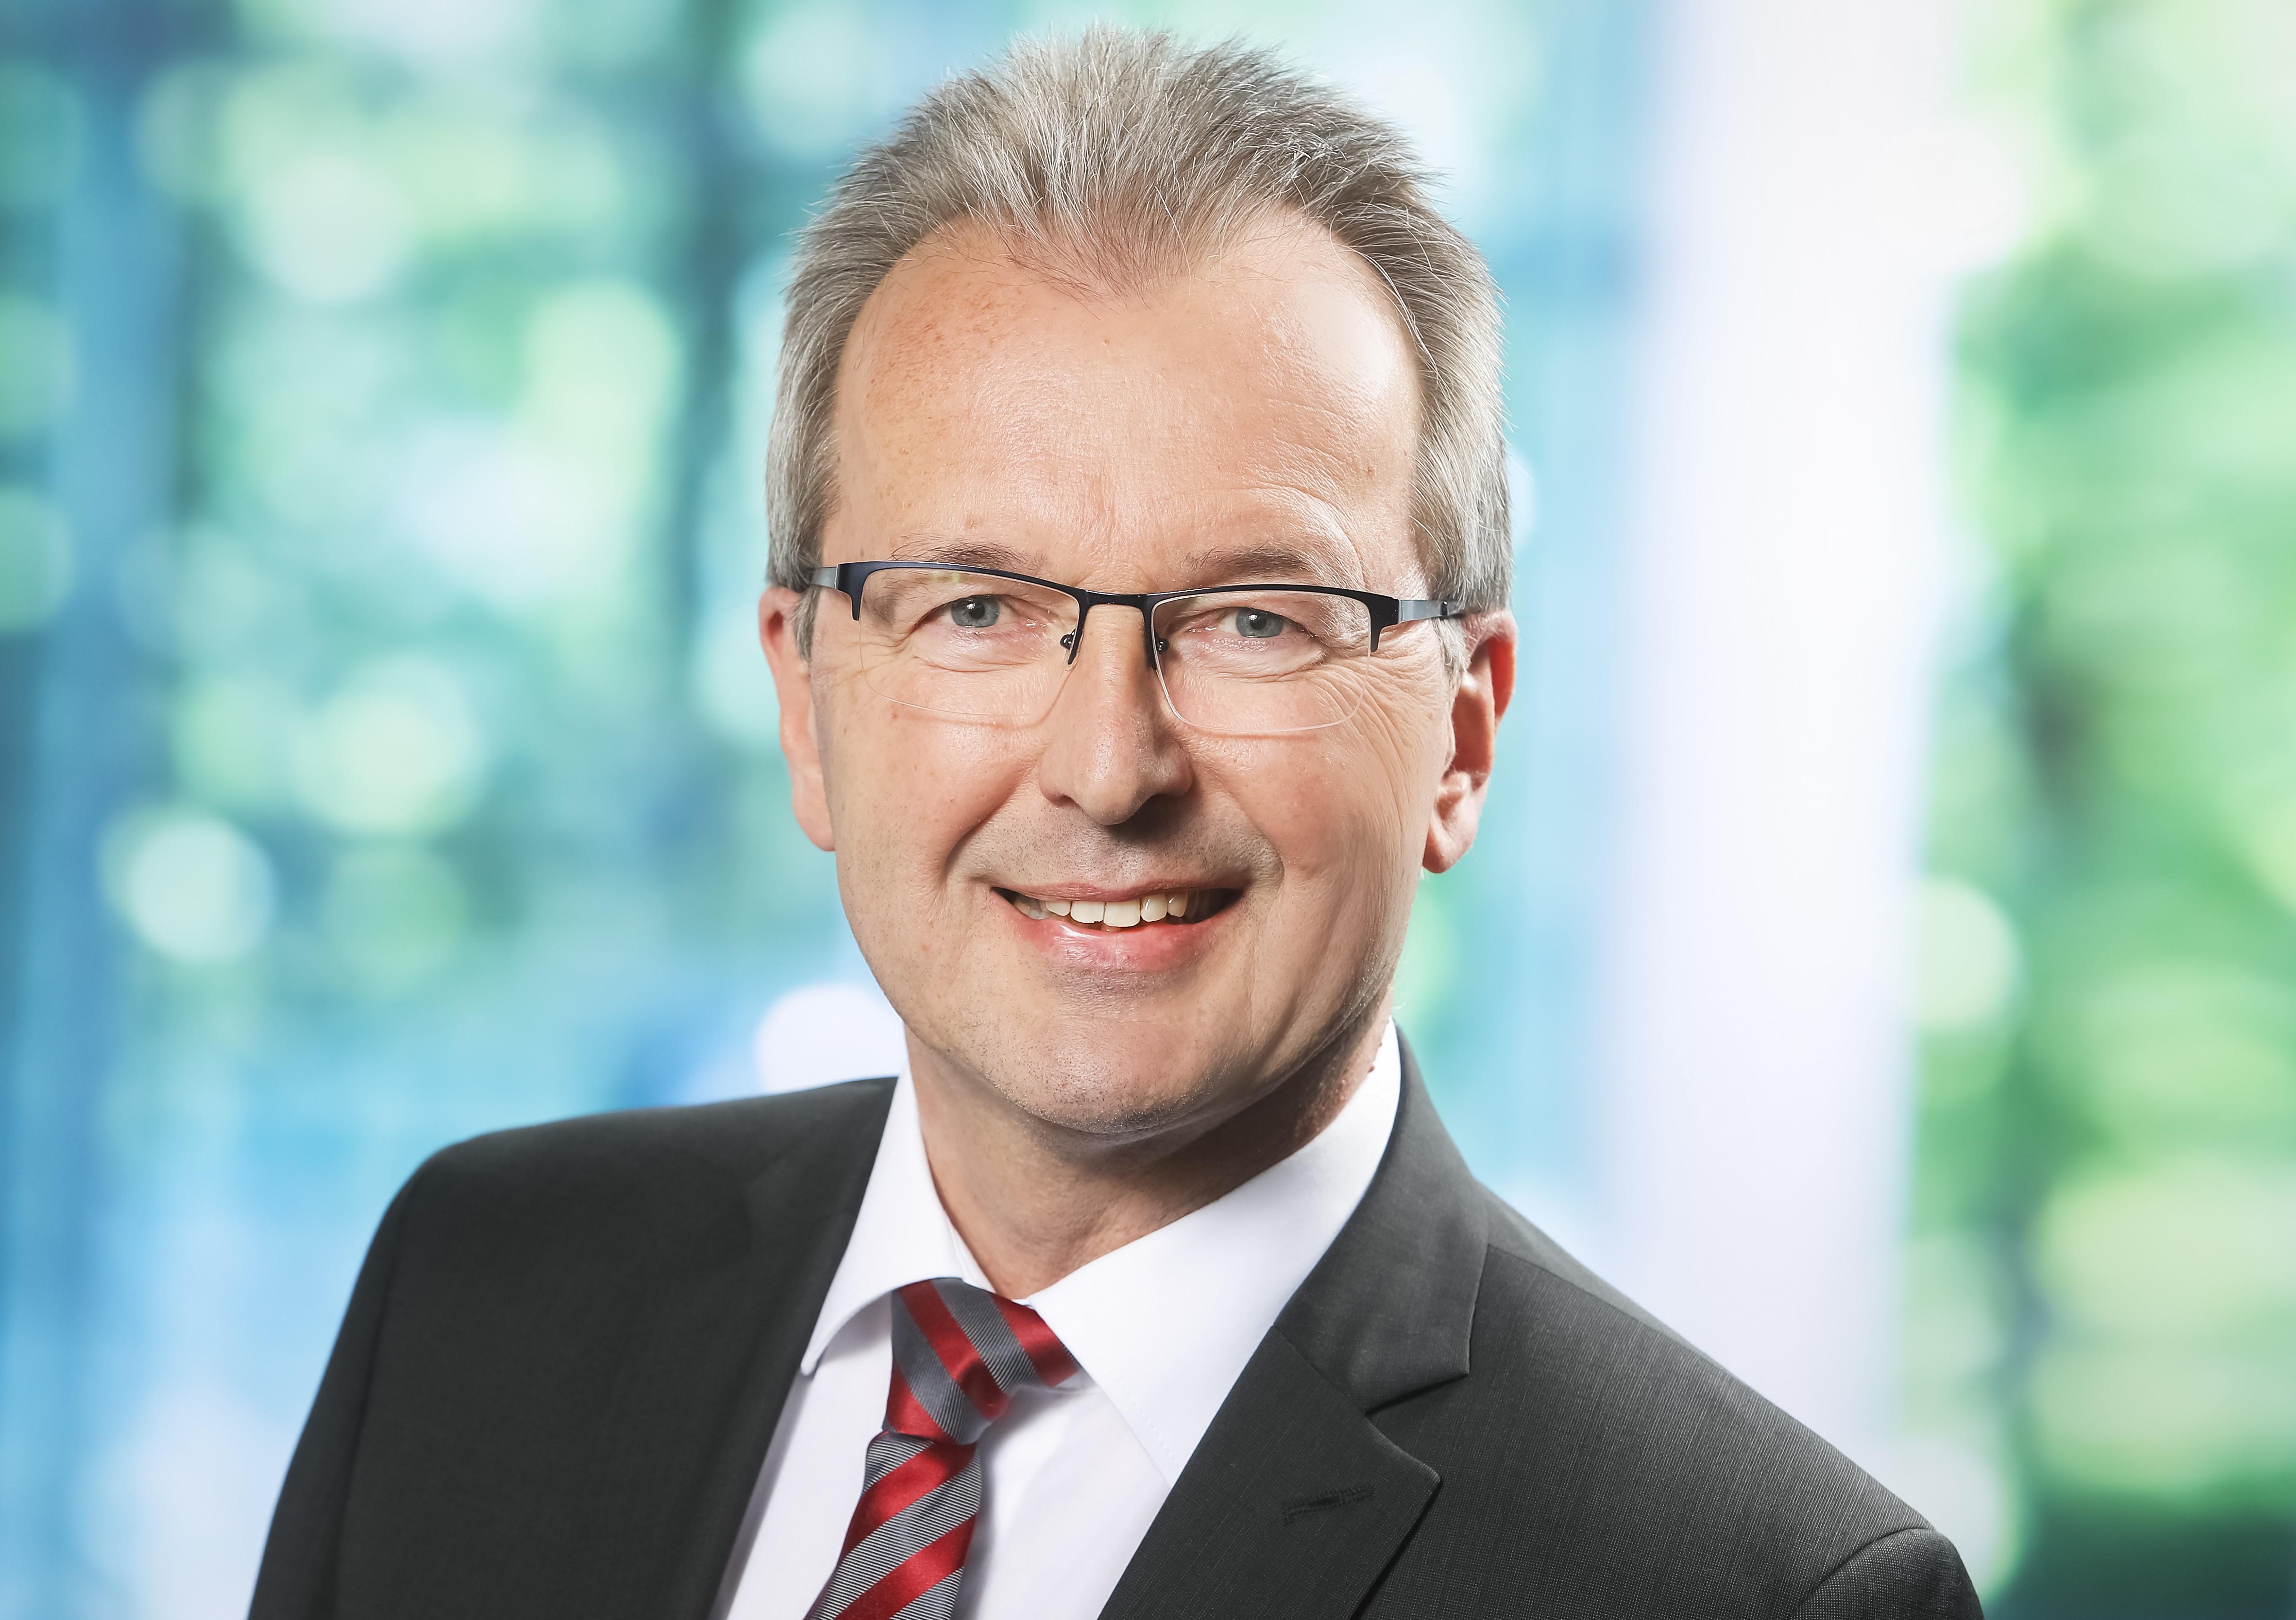 Bürgermeister Rüdiger Gennies